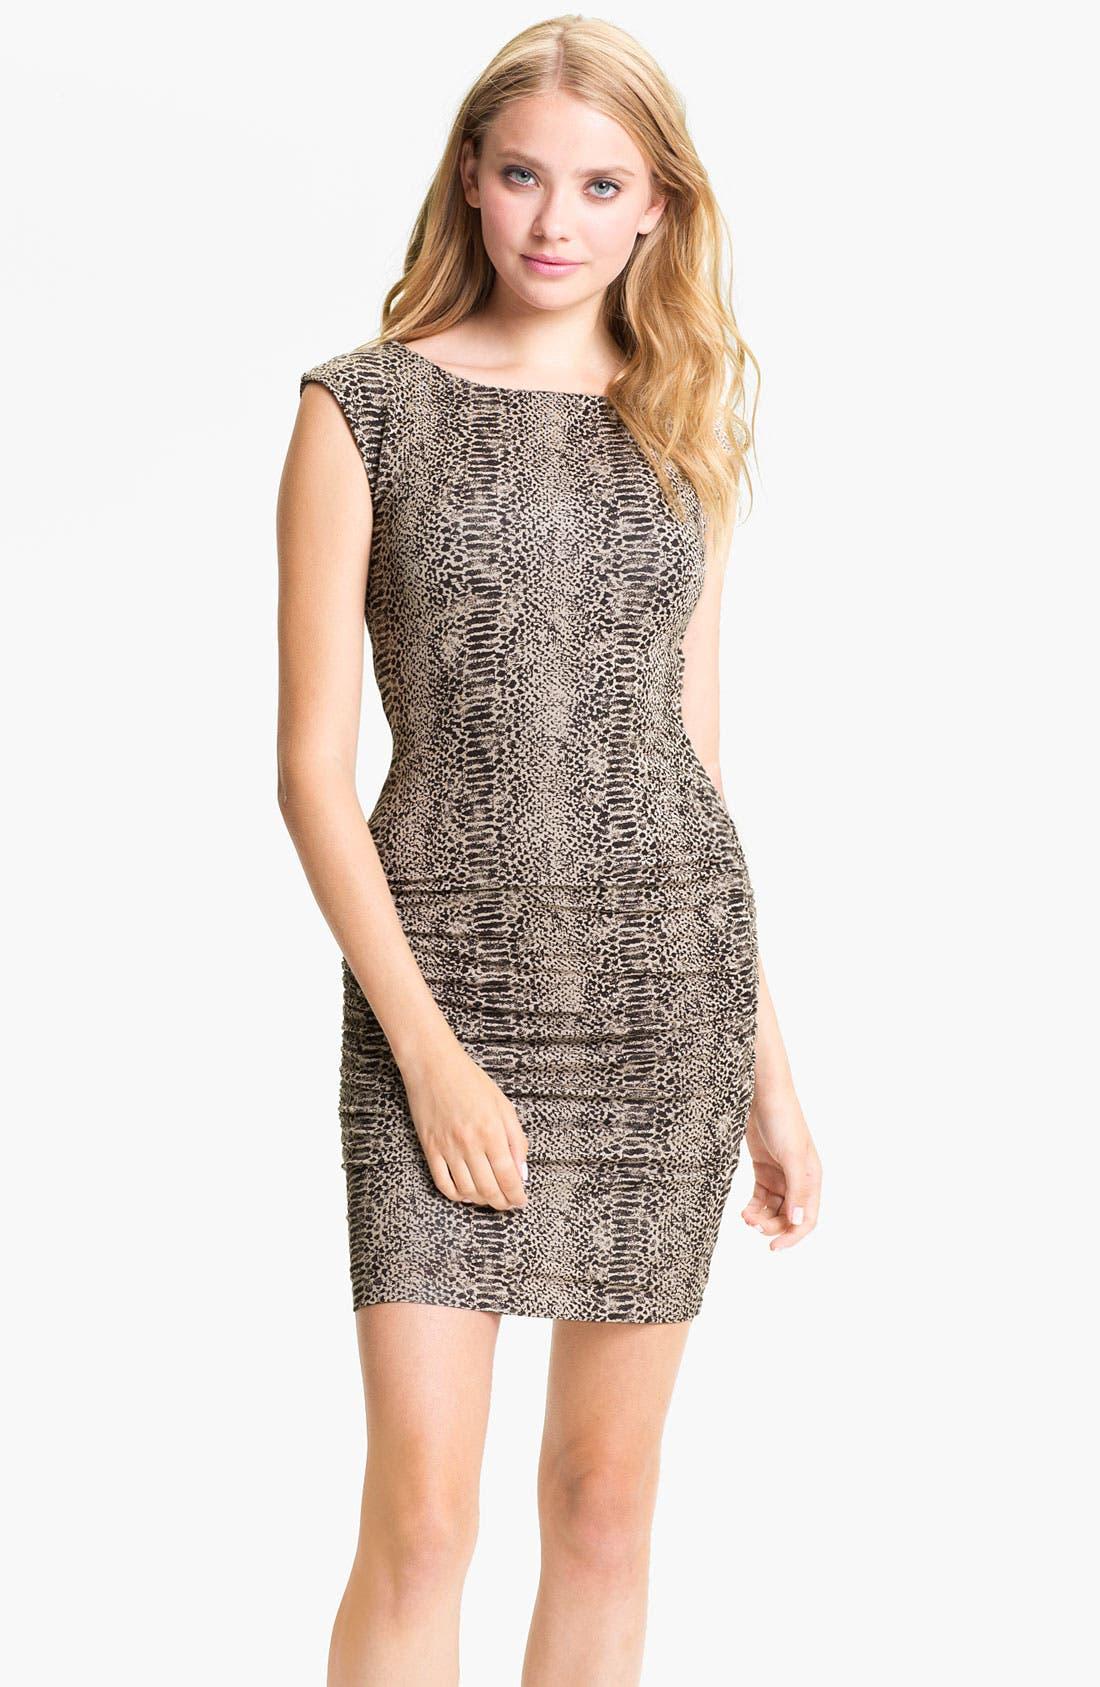 Alternate Image 1 Selected - Tart 'Elena' Reptile Print Sheath Dress